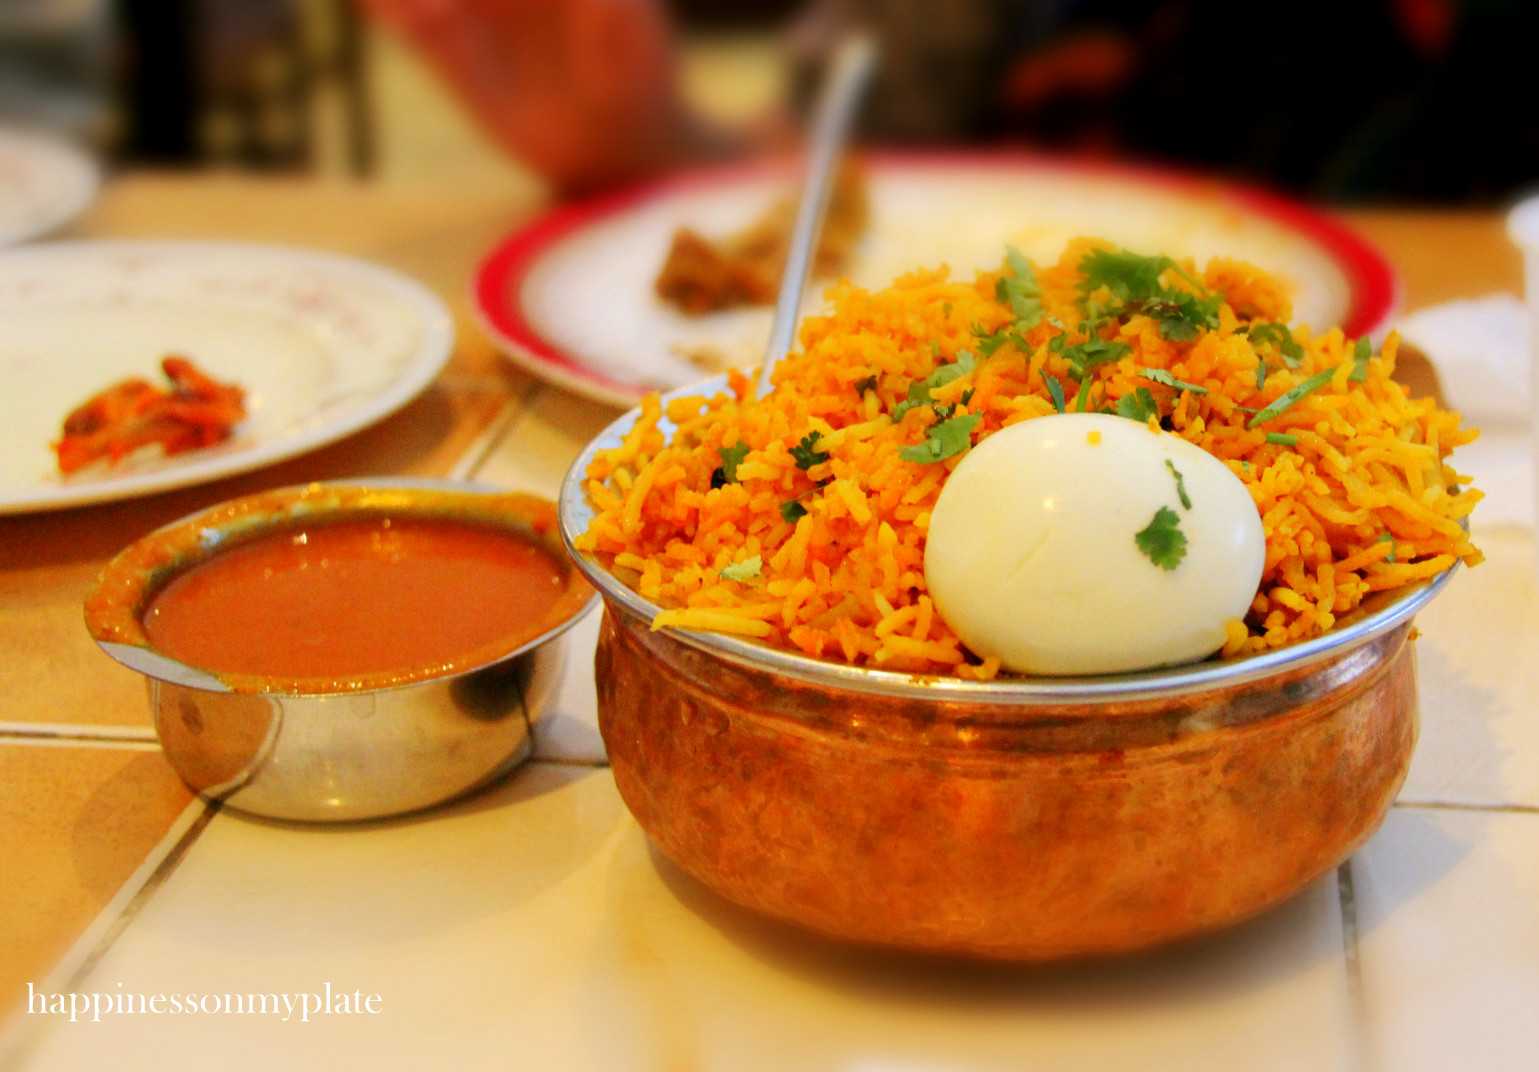 Karachi darbar happiness on my plate chicken dum biryani omr 1400 forumfinder Image collections